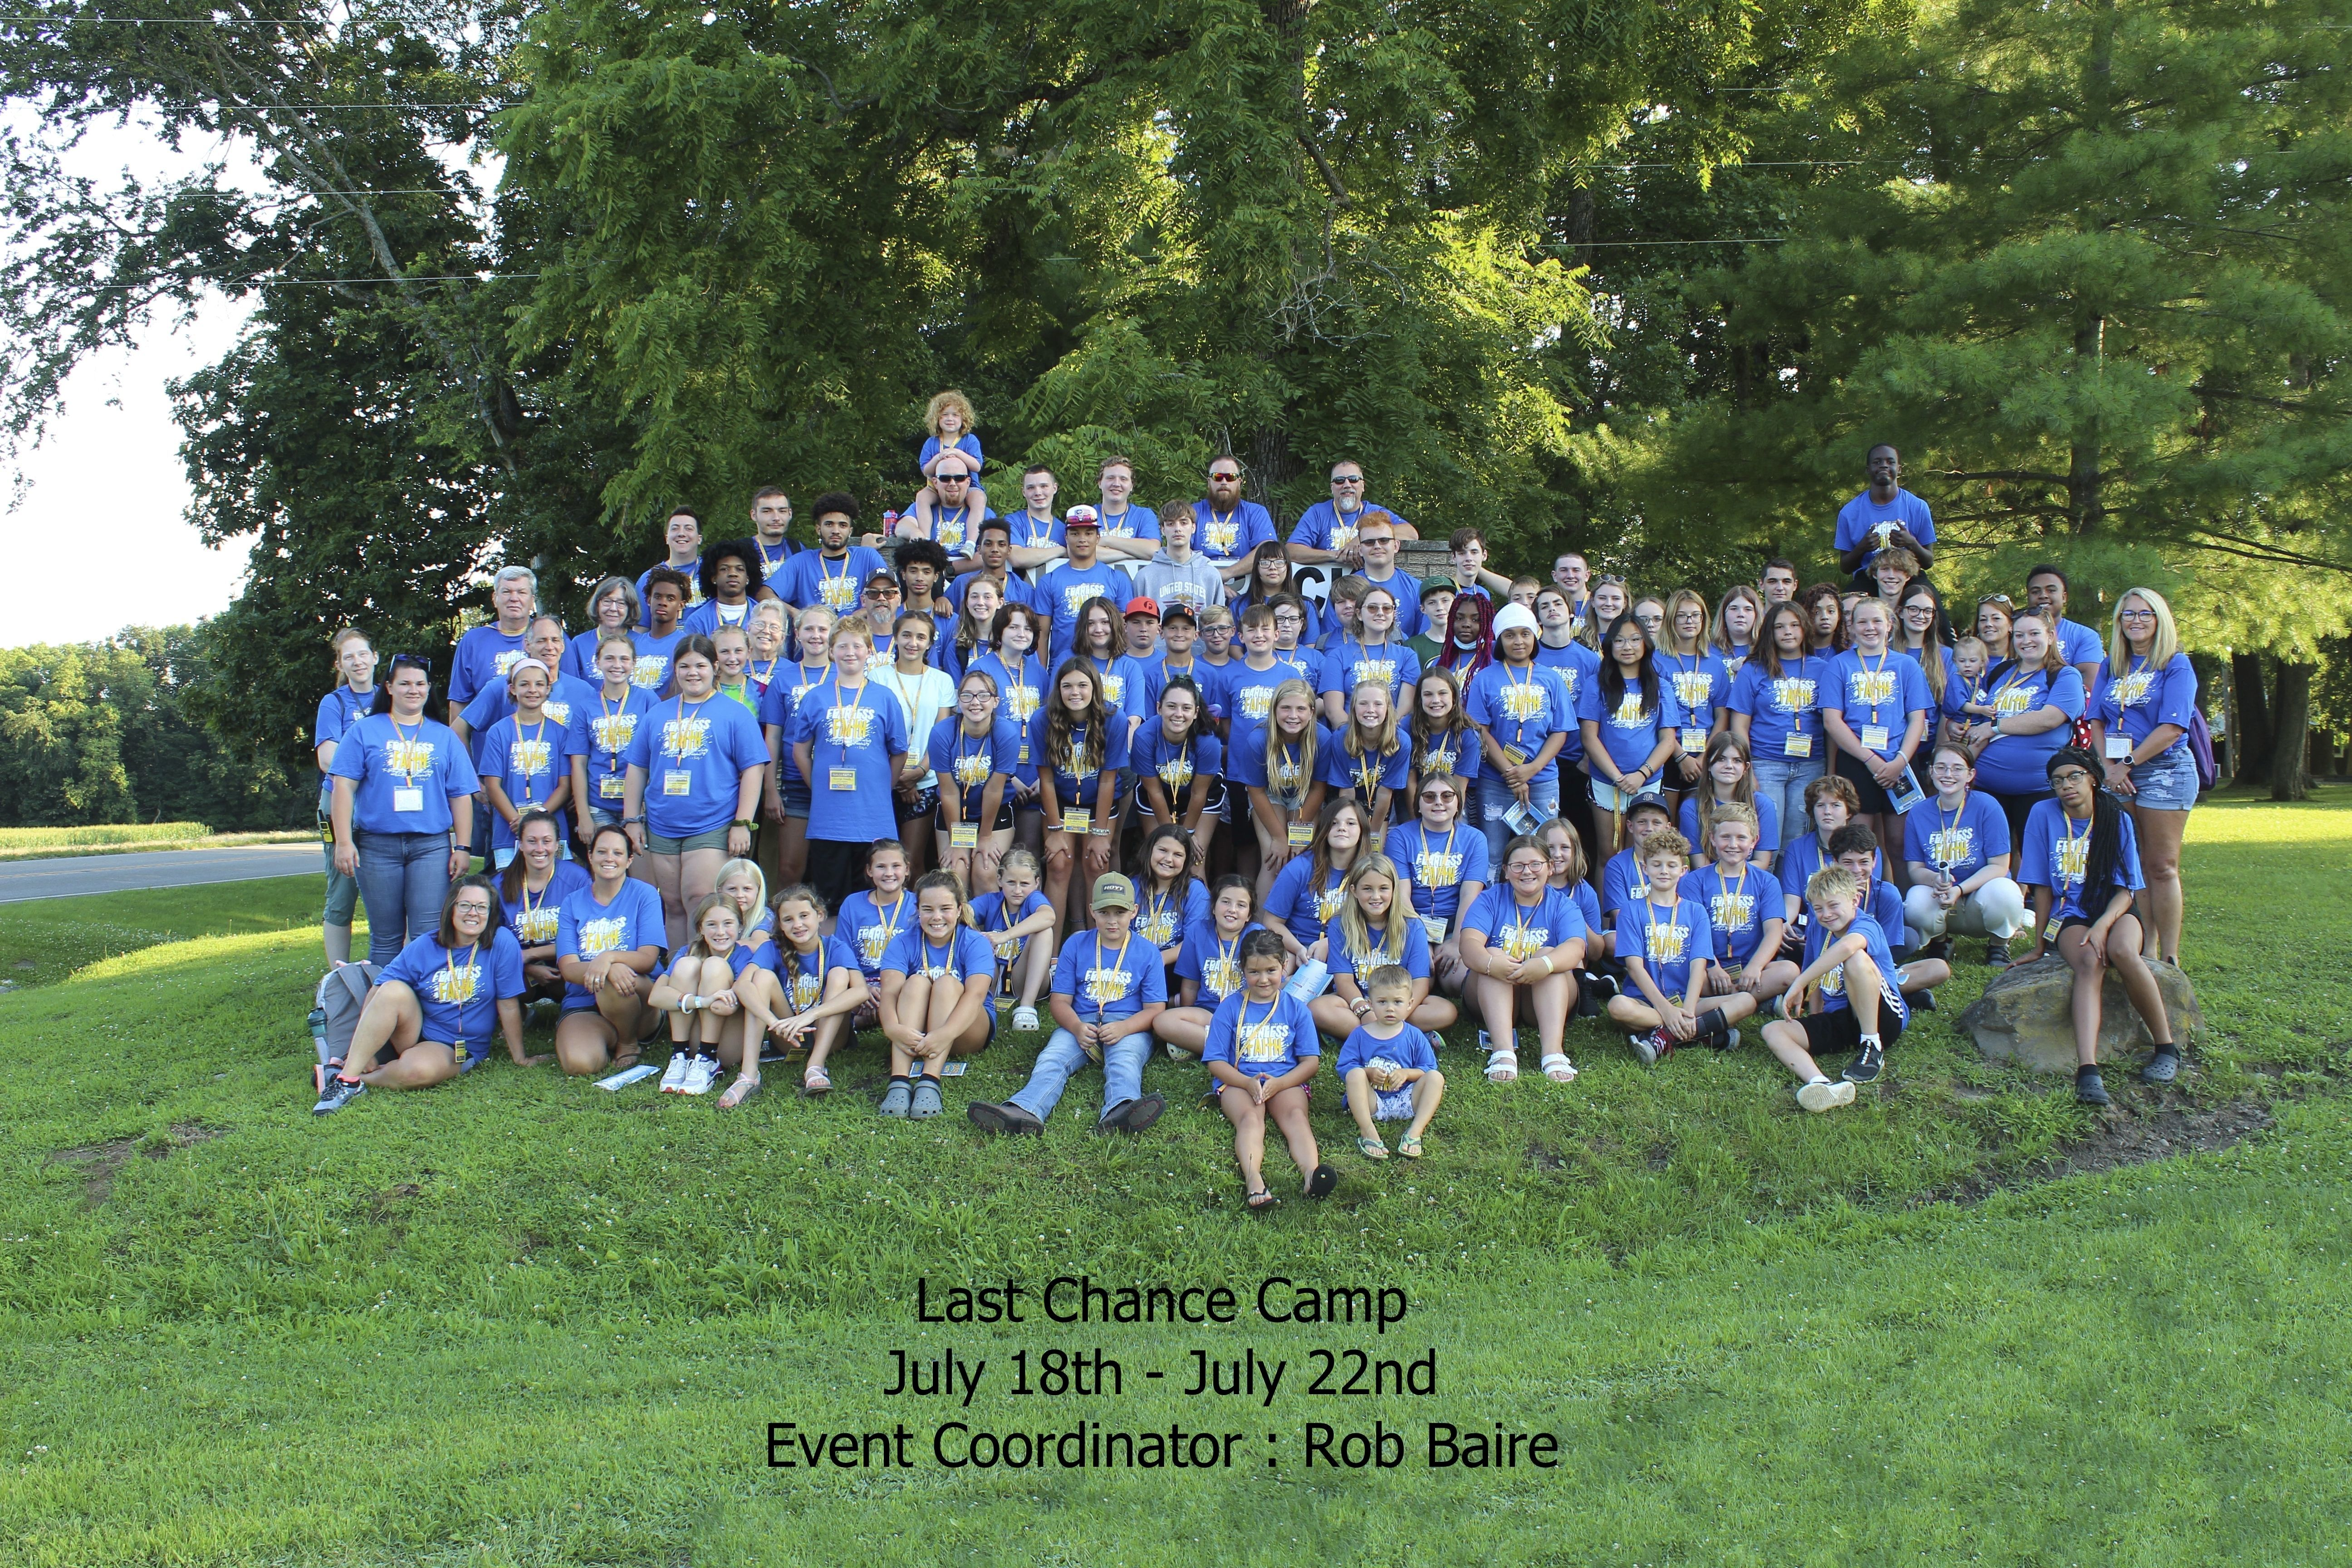 Last Chance Camp